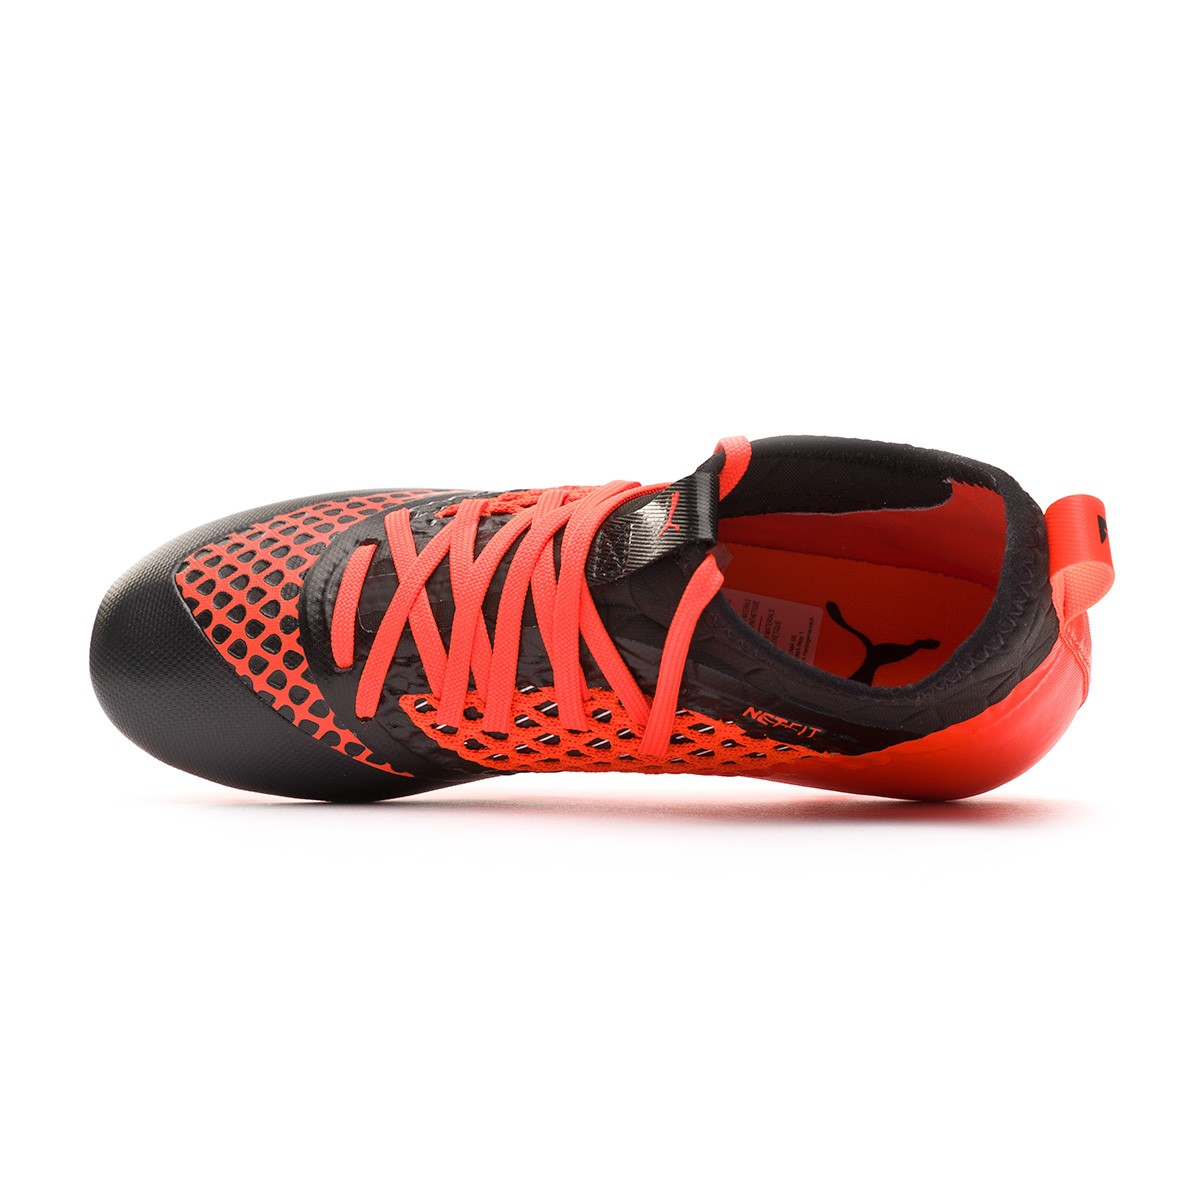 58cbba50c8467 Zapatos de fútbol Puma Future 2.3 Netfit FG AG Niño Puma black-Shocking  orange - Leaked soccer